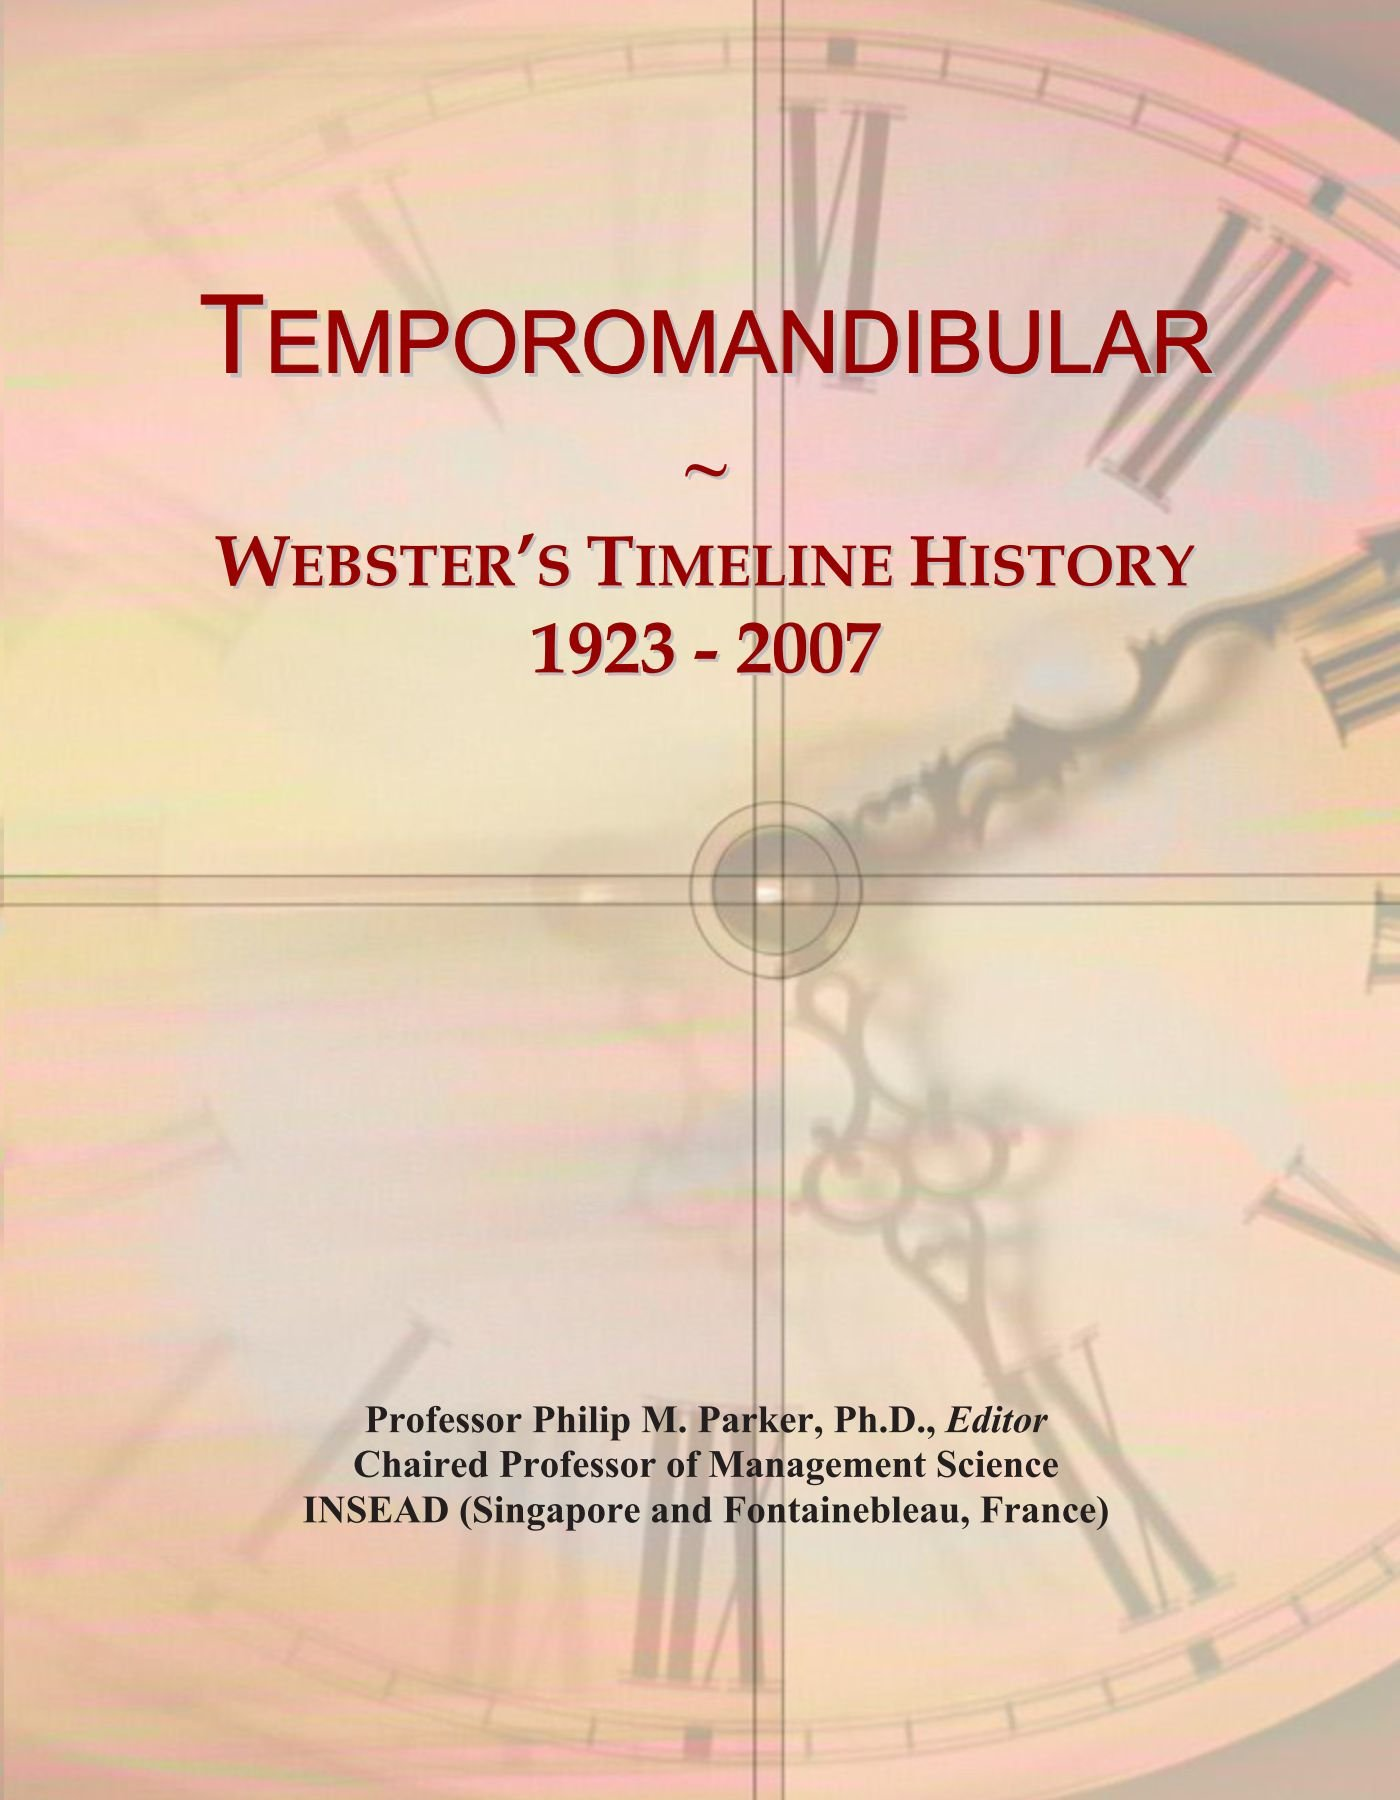 Temporomandibular: Webster's Timeline History, 1923 - 2007